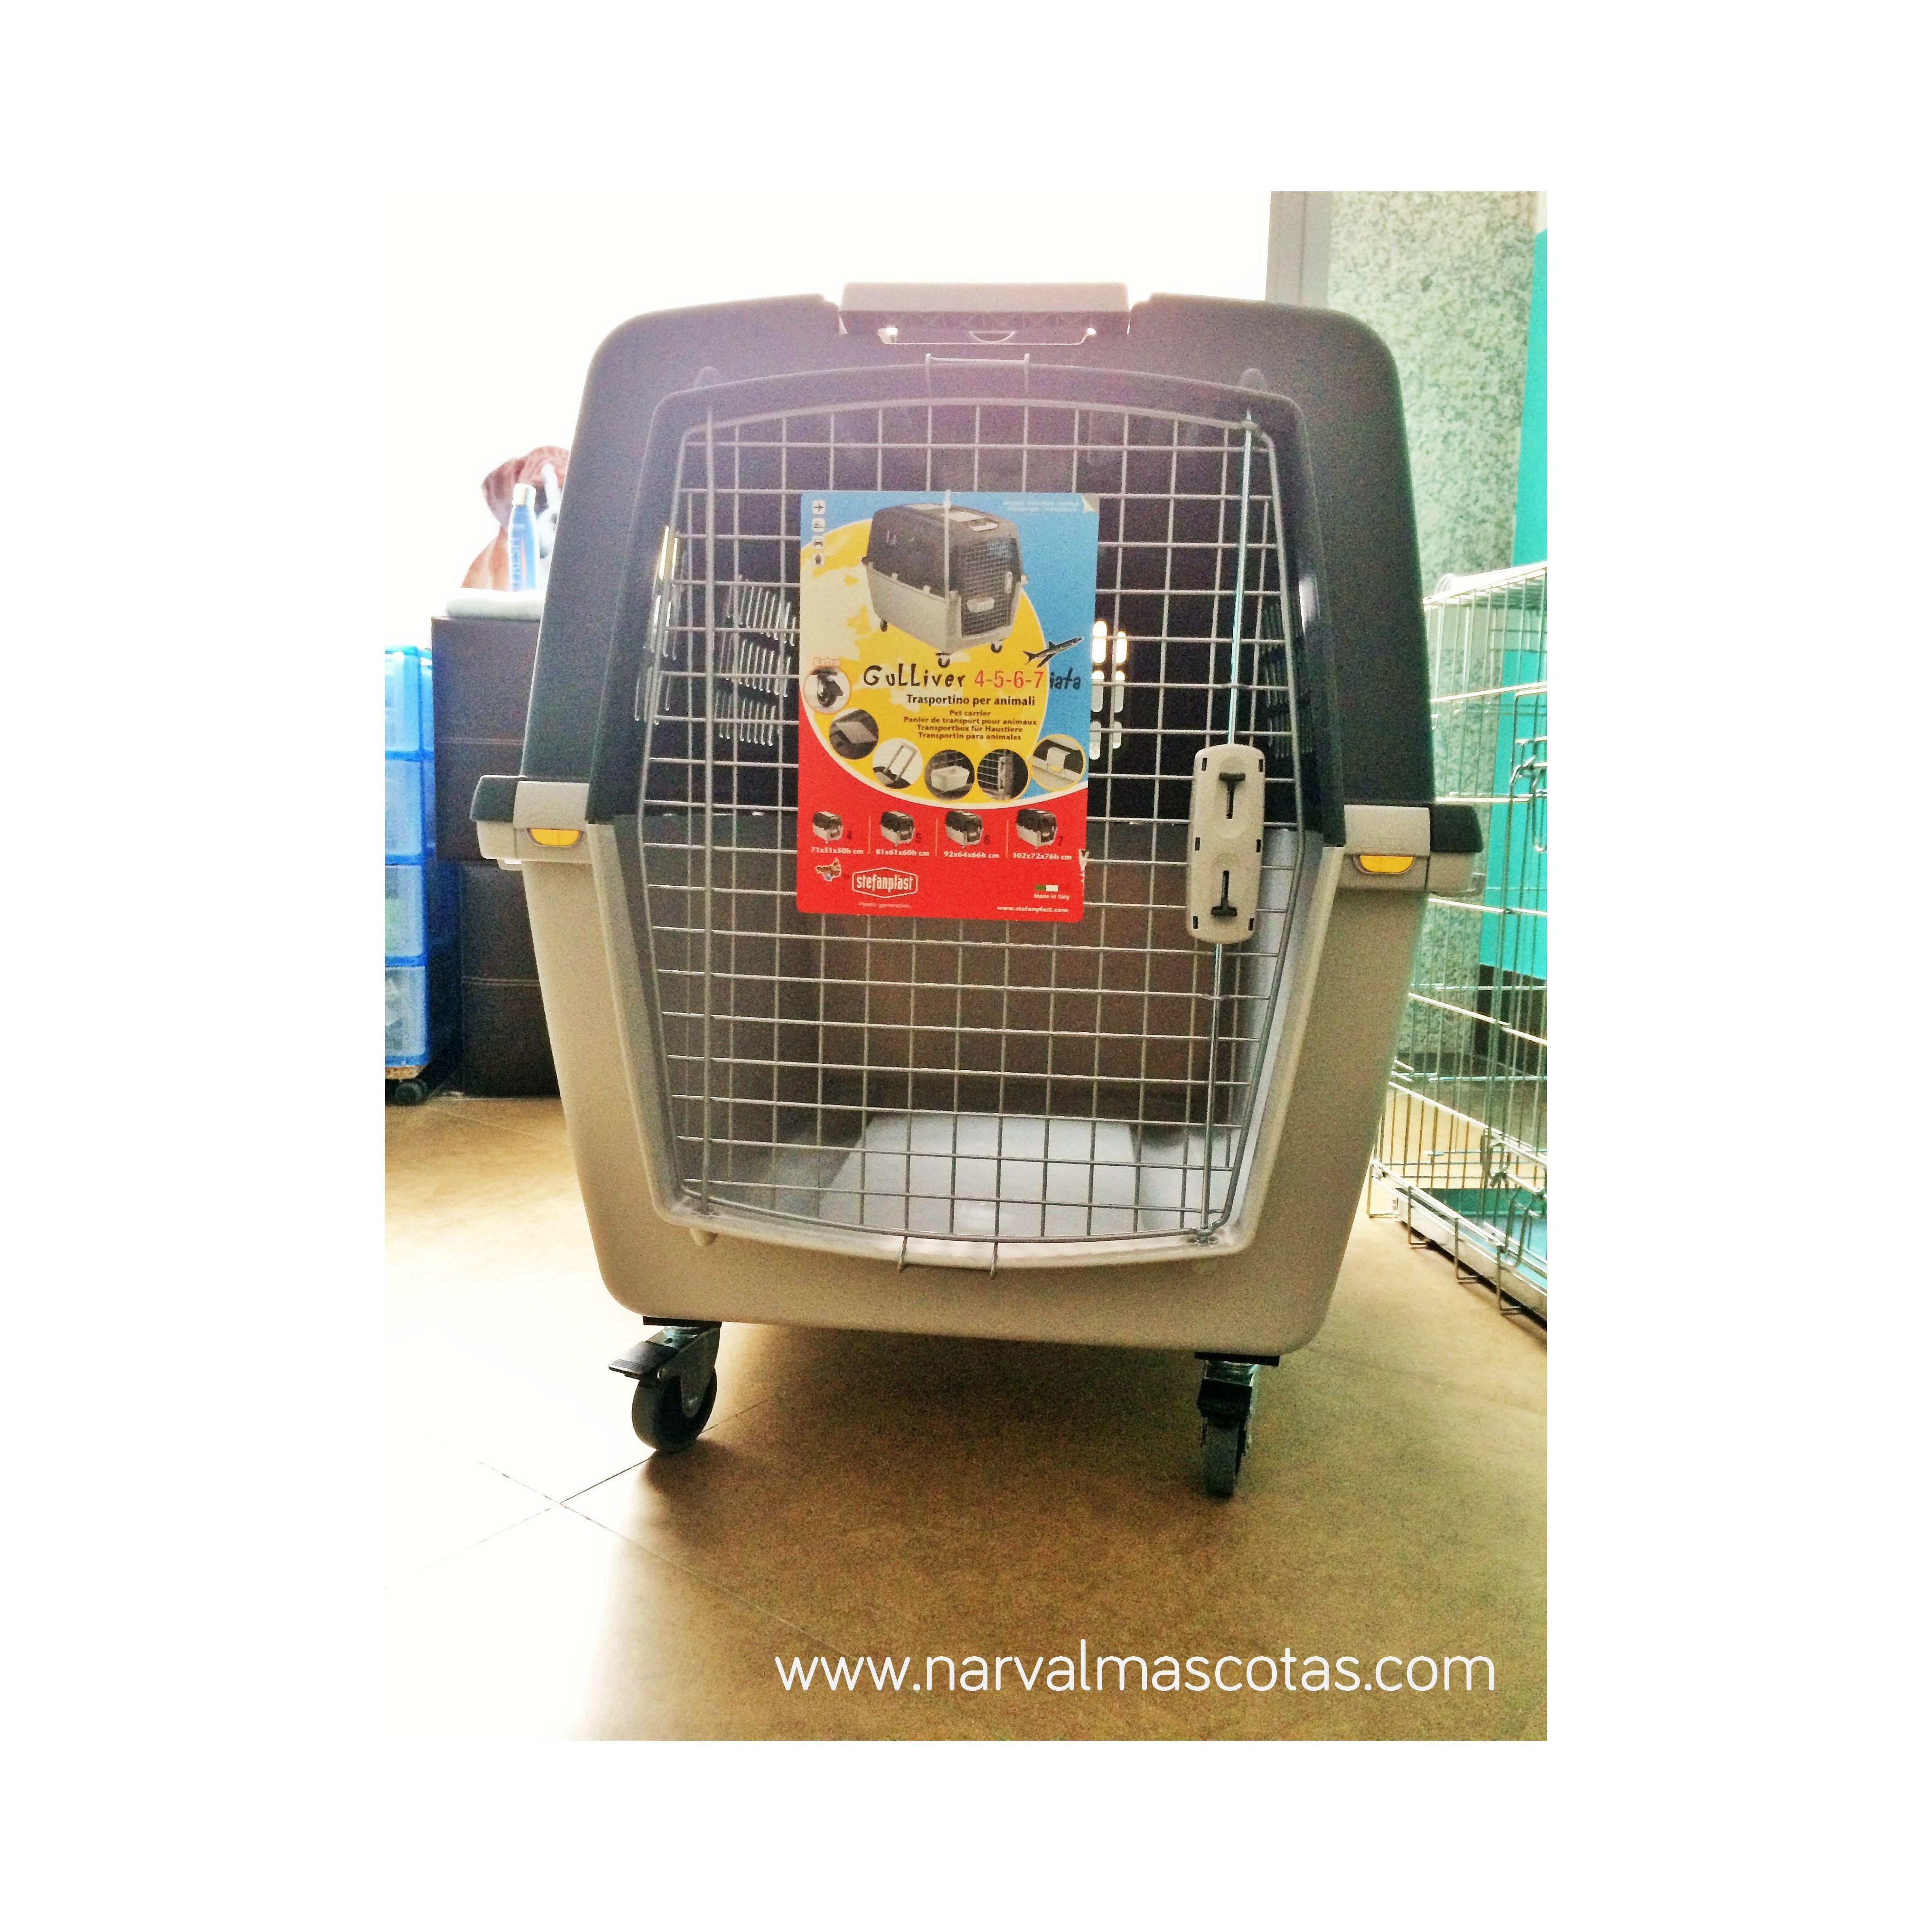 Transportín Gulliver 7 IATA: Productos y Servicios de Narval Mascotas